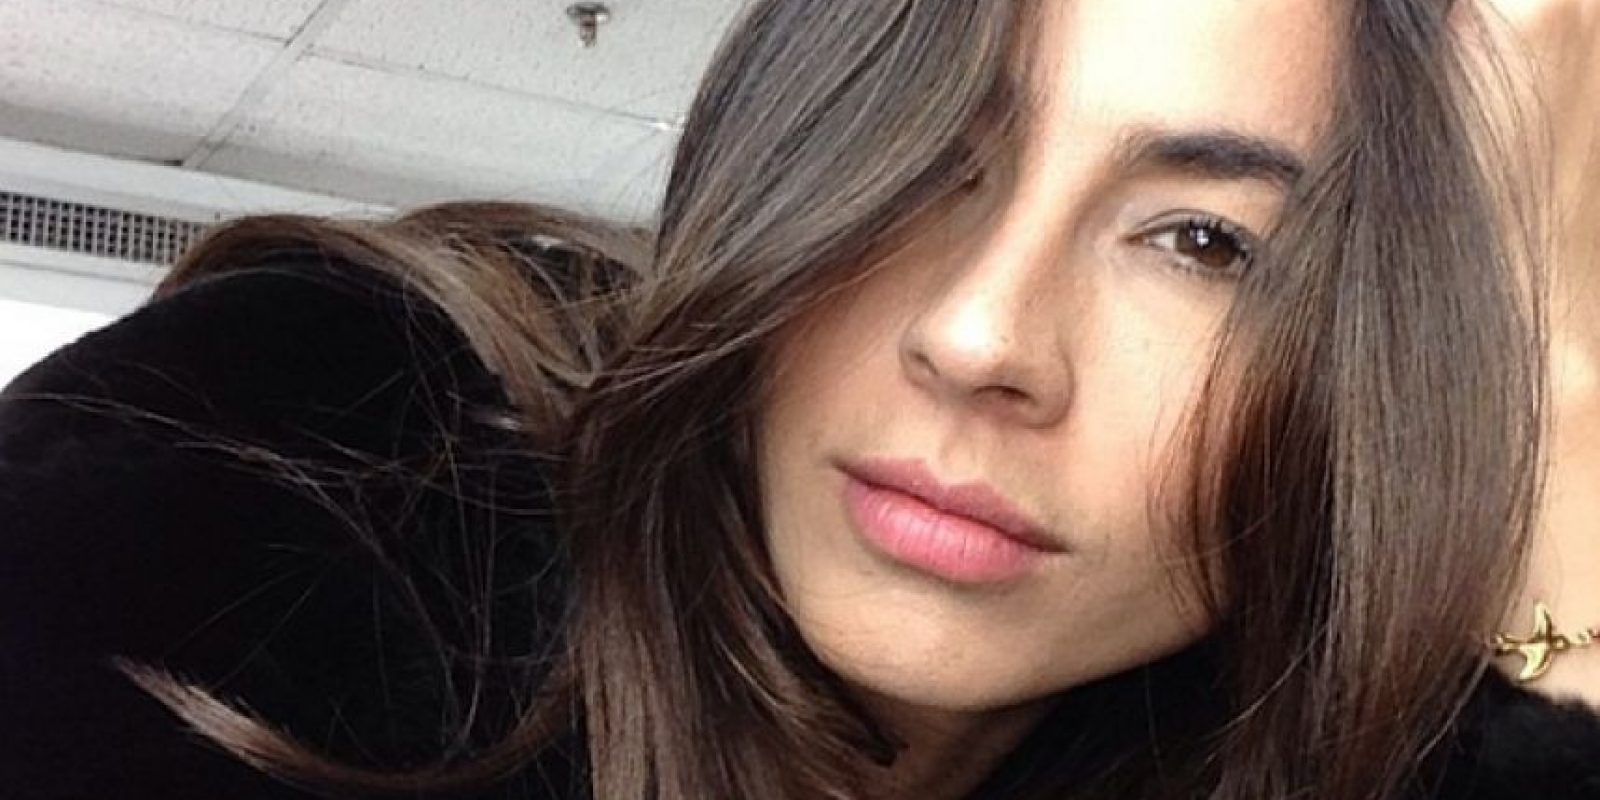 Ass Selfie Carla Giraldo naked photo 2017